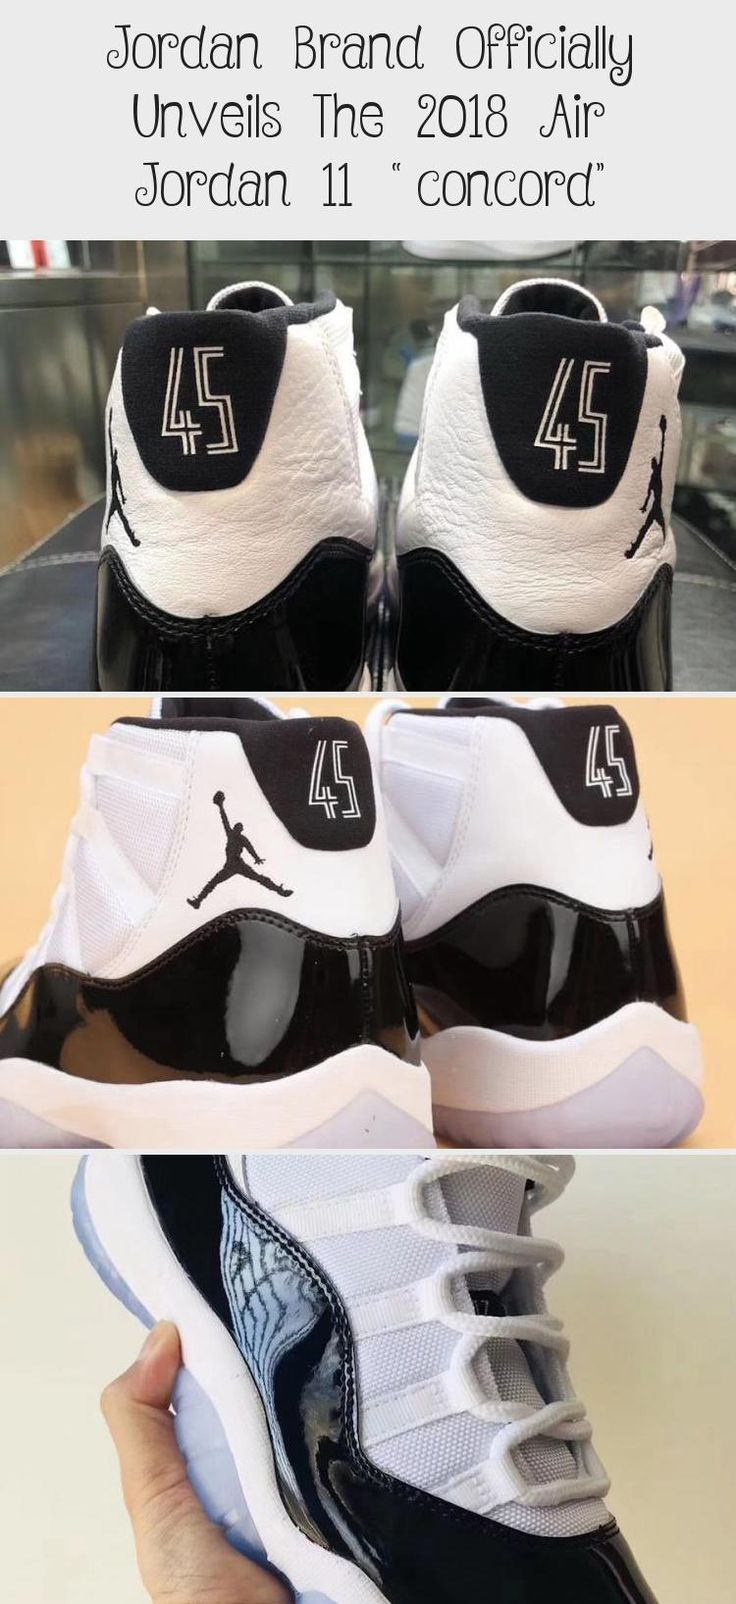 Jordan Brand Officially Unveils The 2018 Air Jordan 11